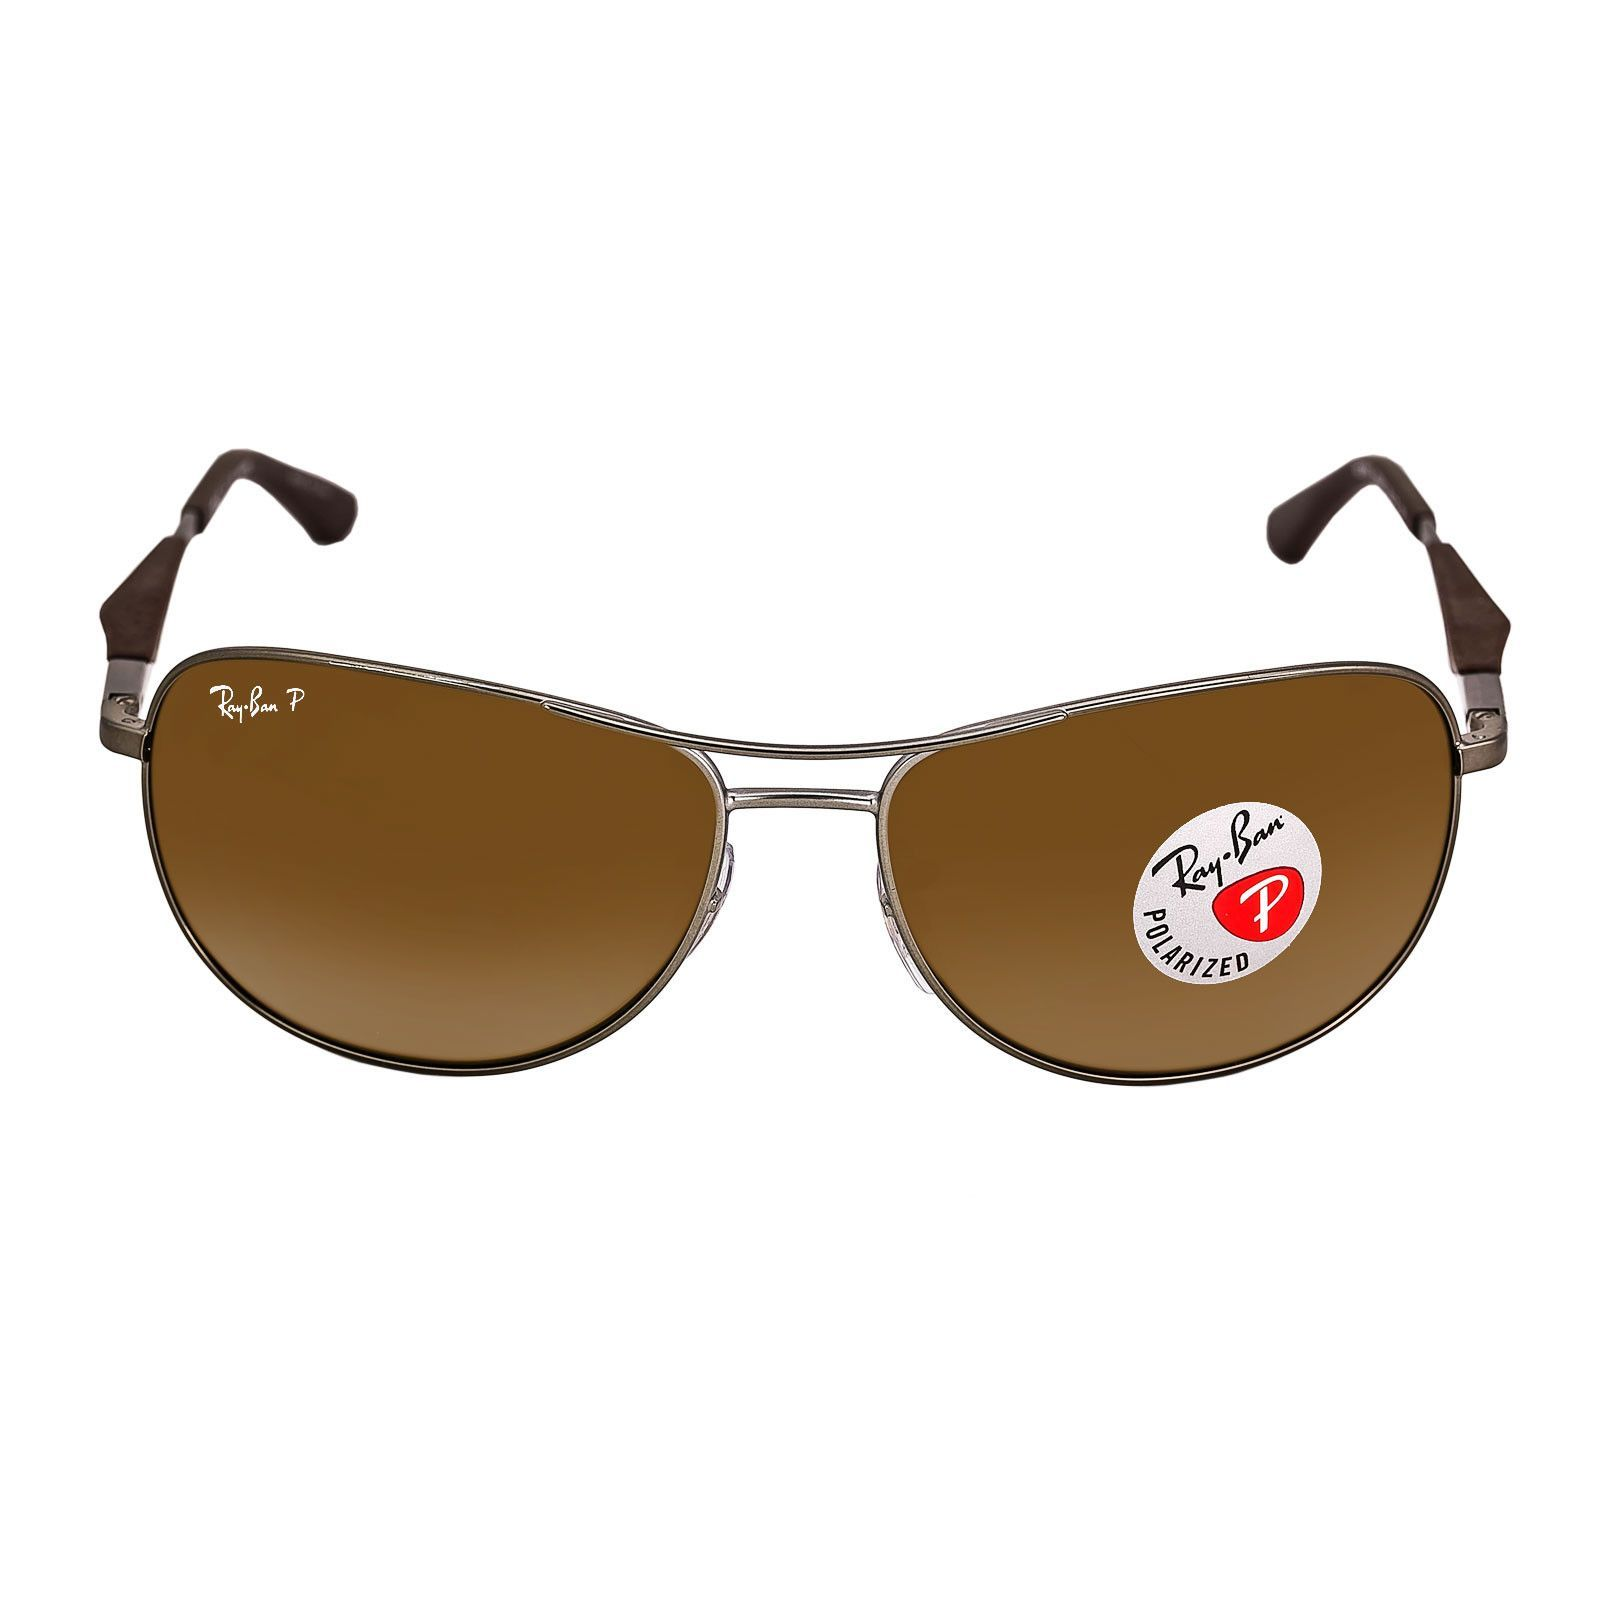 949daa2701 Ray-Ban RB 3519 029-83 59 Men s Polarized Brown Classic B-15 Lenses  Gunmetal Metal Frame Sunglasses